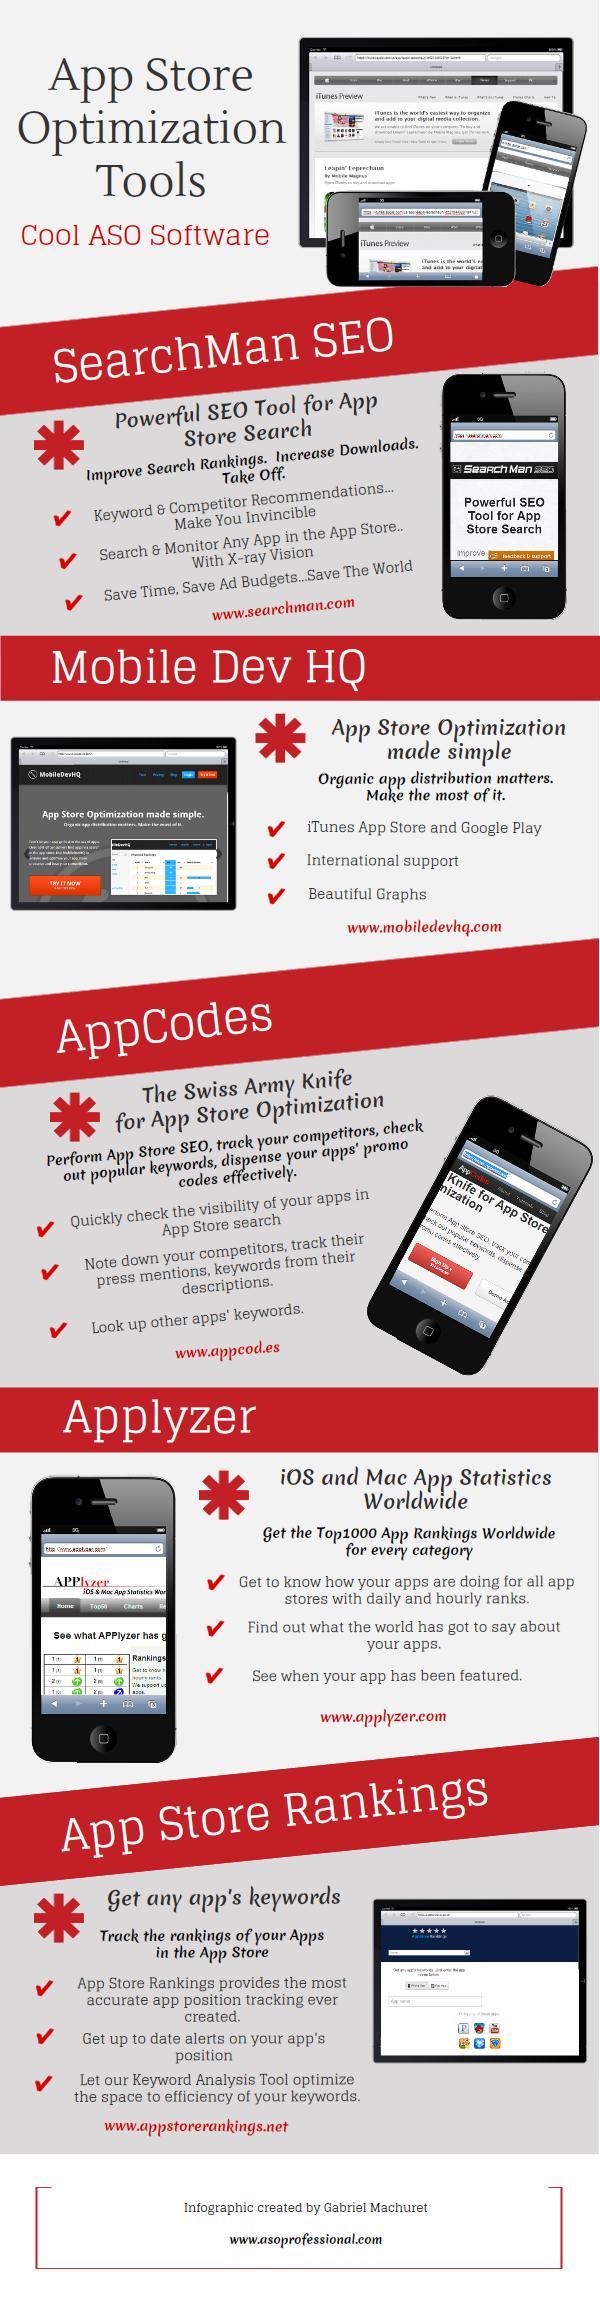 App store Optimization Tools [Infographic] | App store